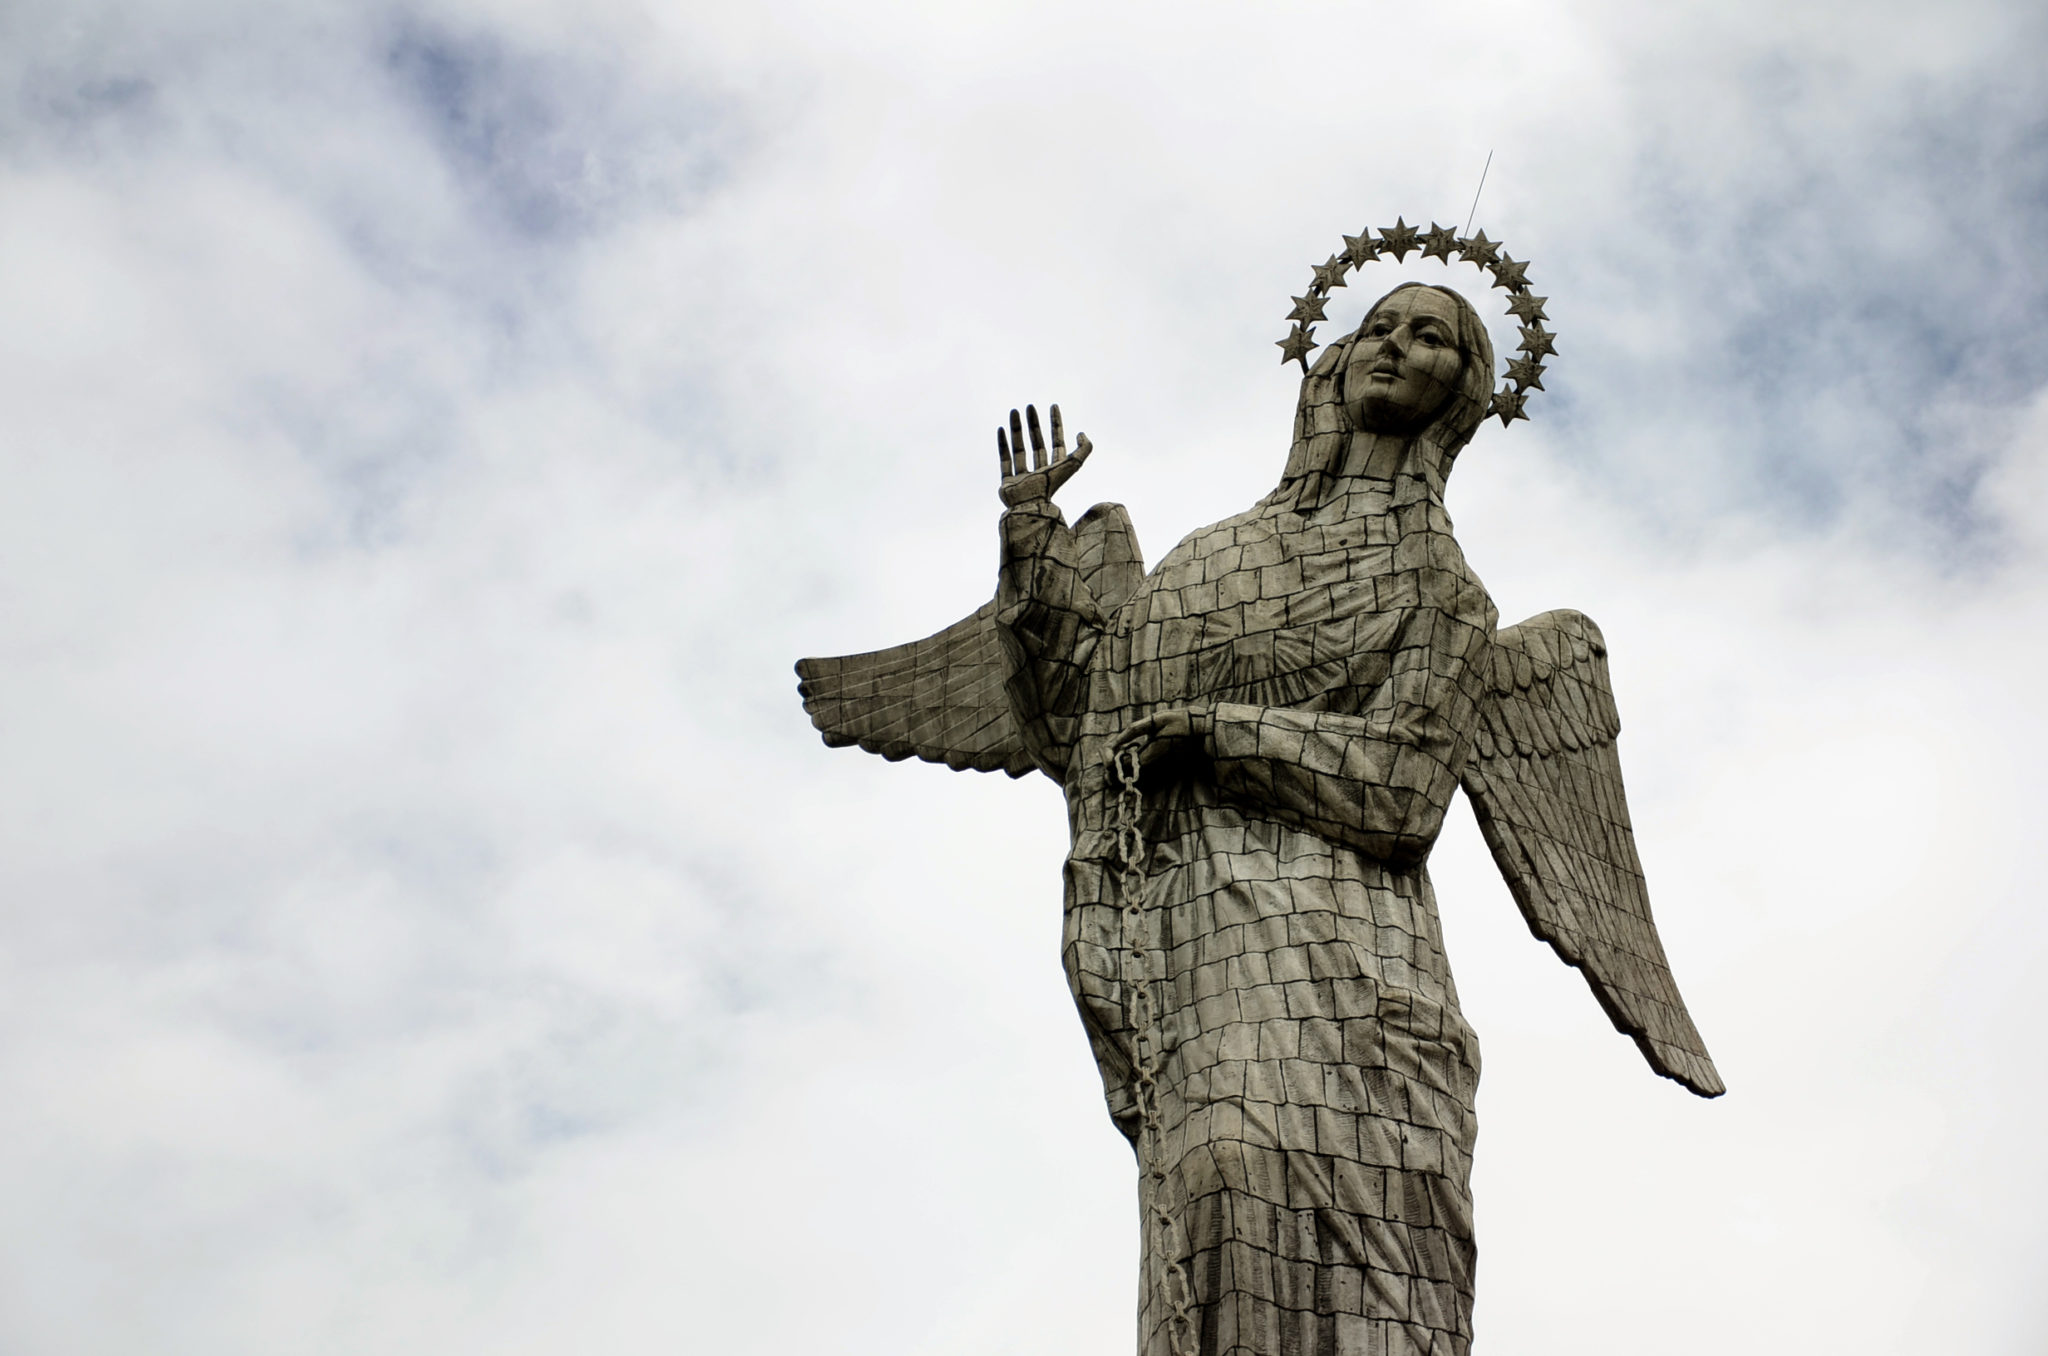 Sehenswuerdigkeiten-Ecuador-Quito-El-Panecillo-Statue